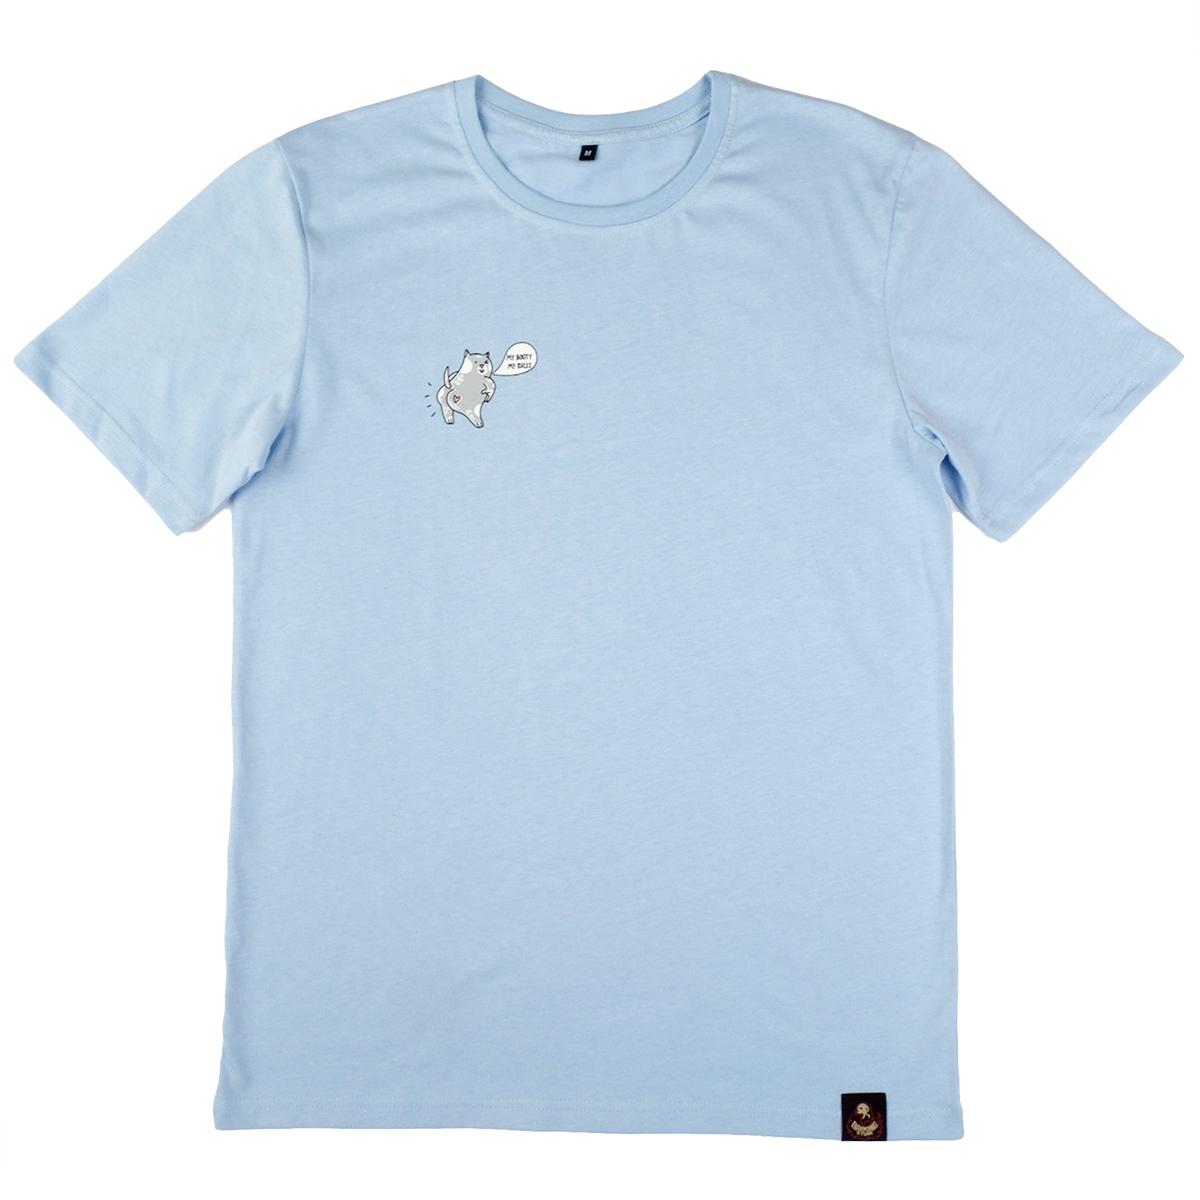 My rules / футболка